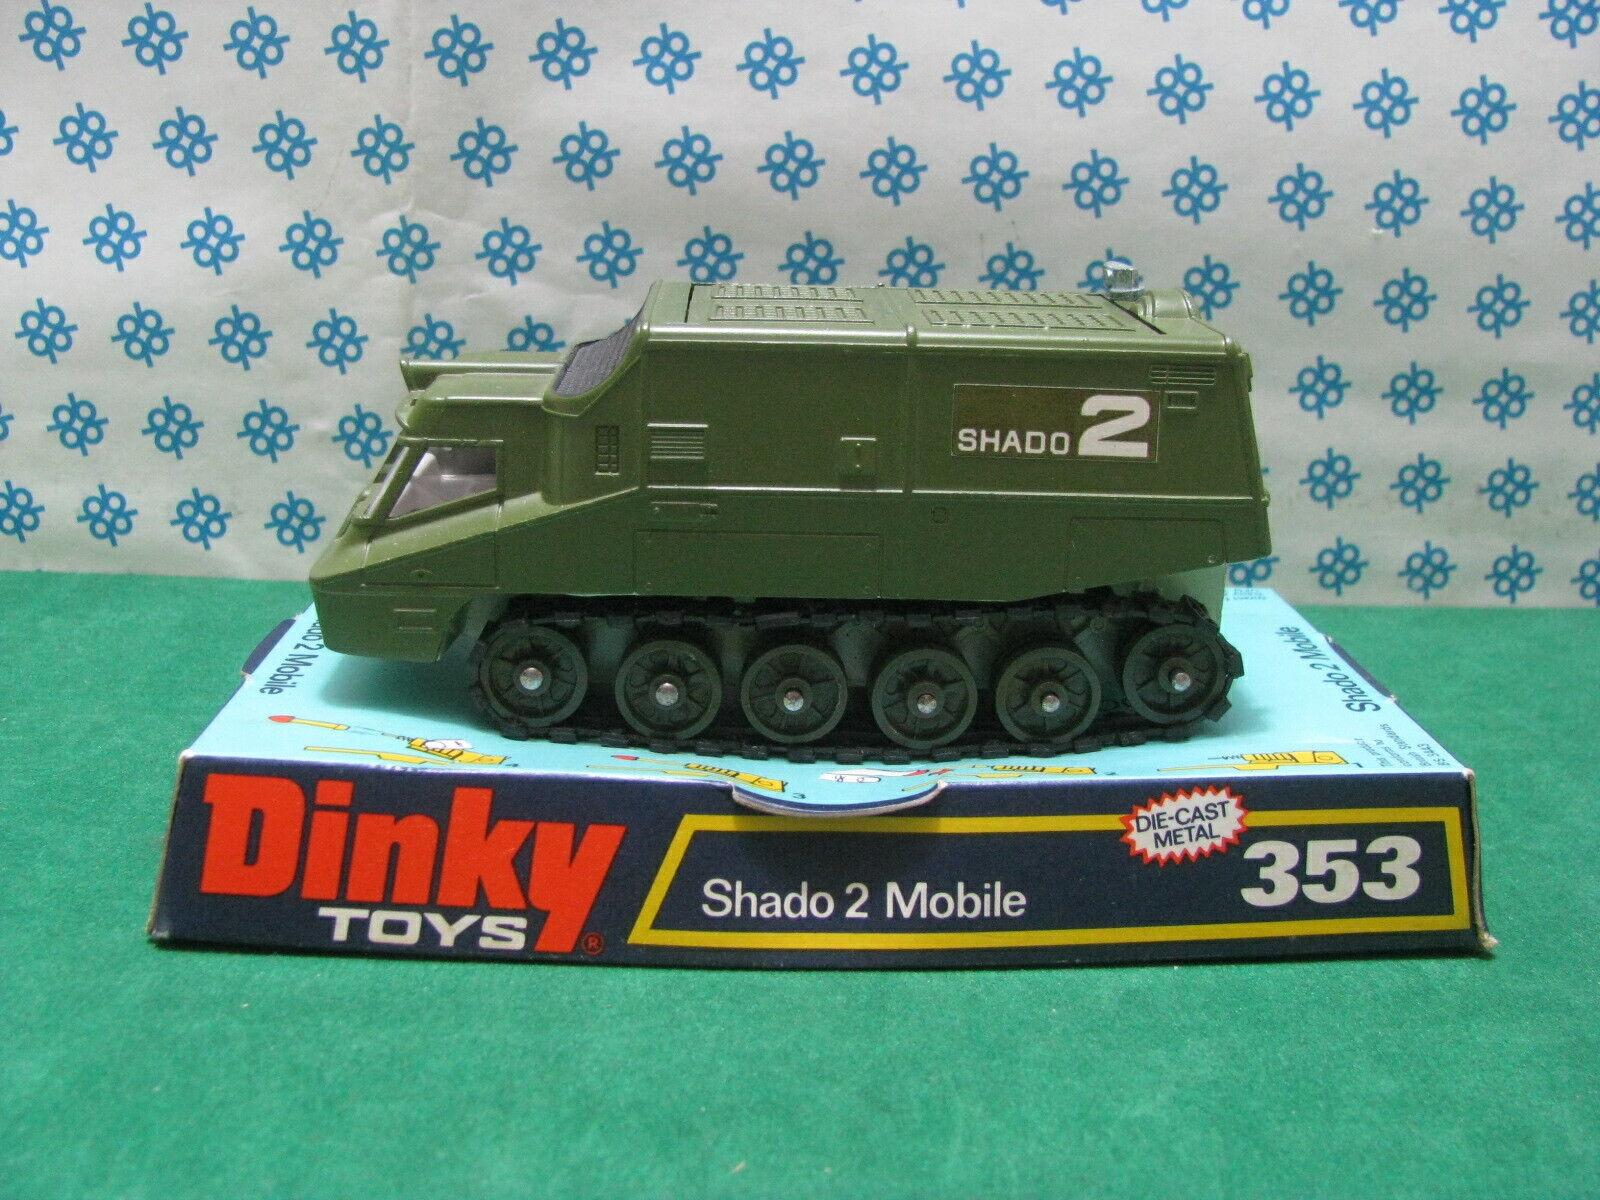 Vintage - Shado 2 Mobile UFO - Dinky Toys 353 Gerry Anderson - MIB